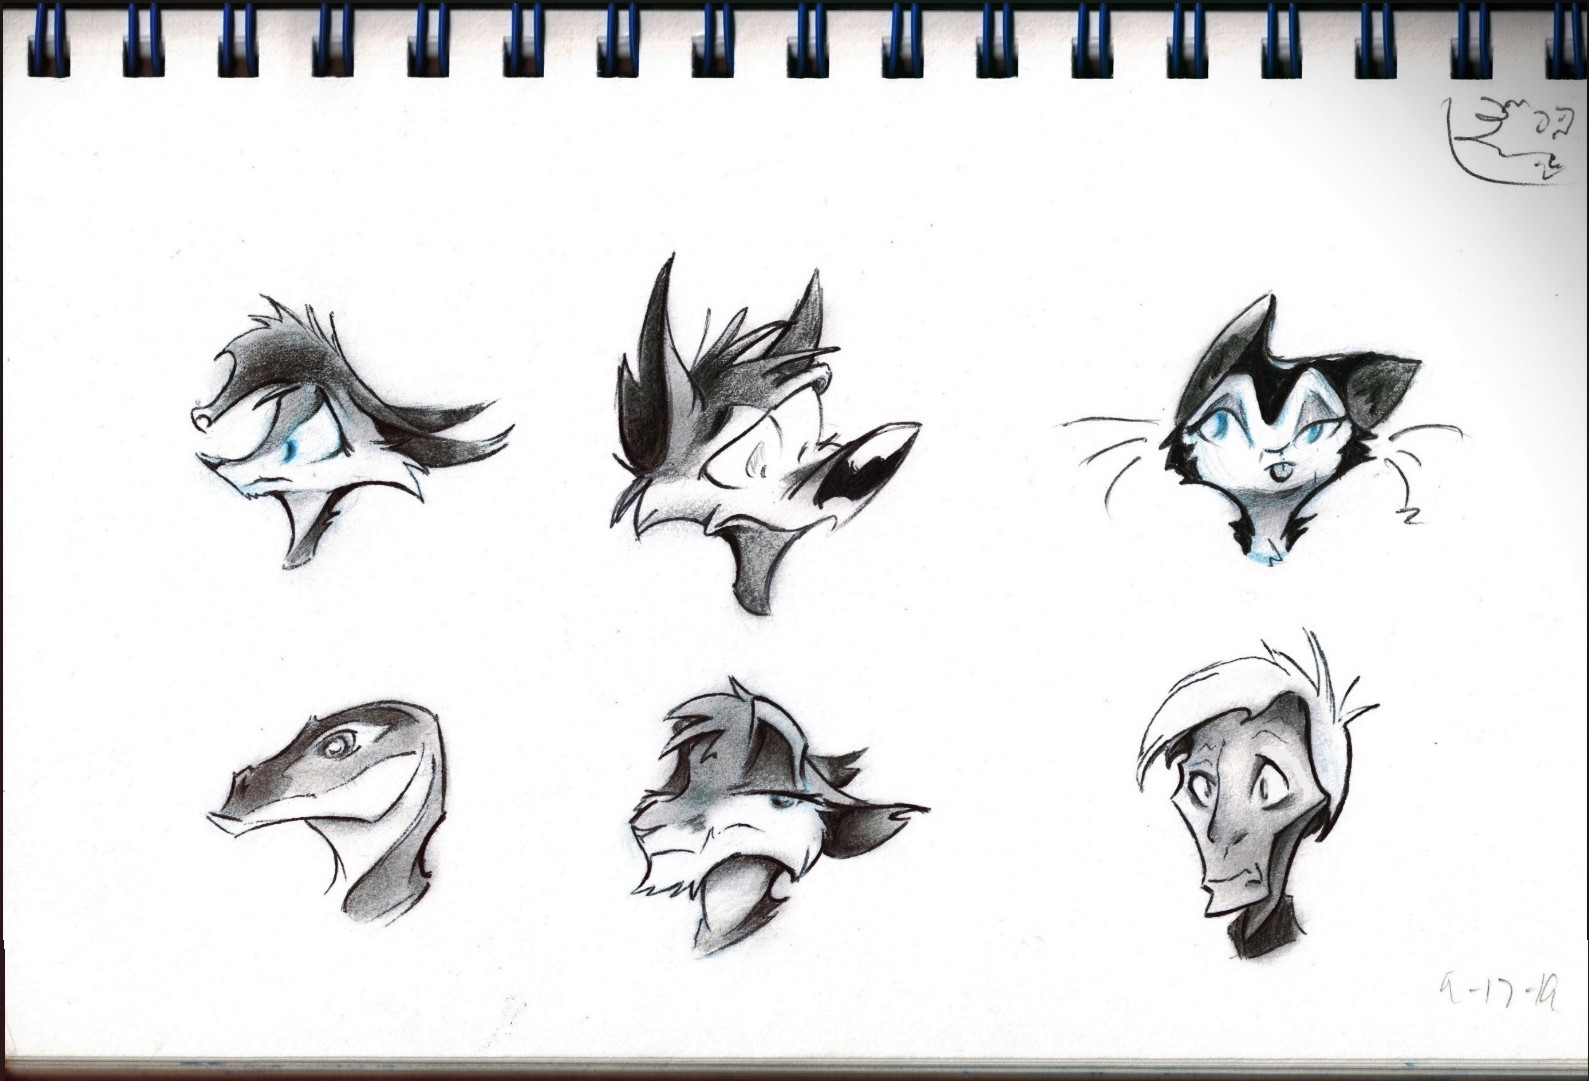 Some random character headshots